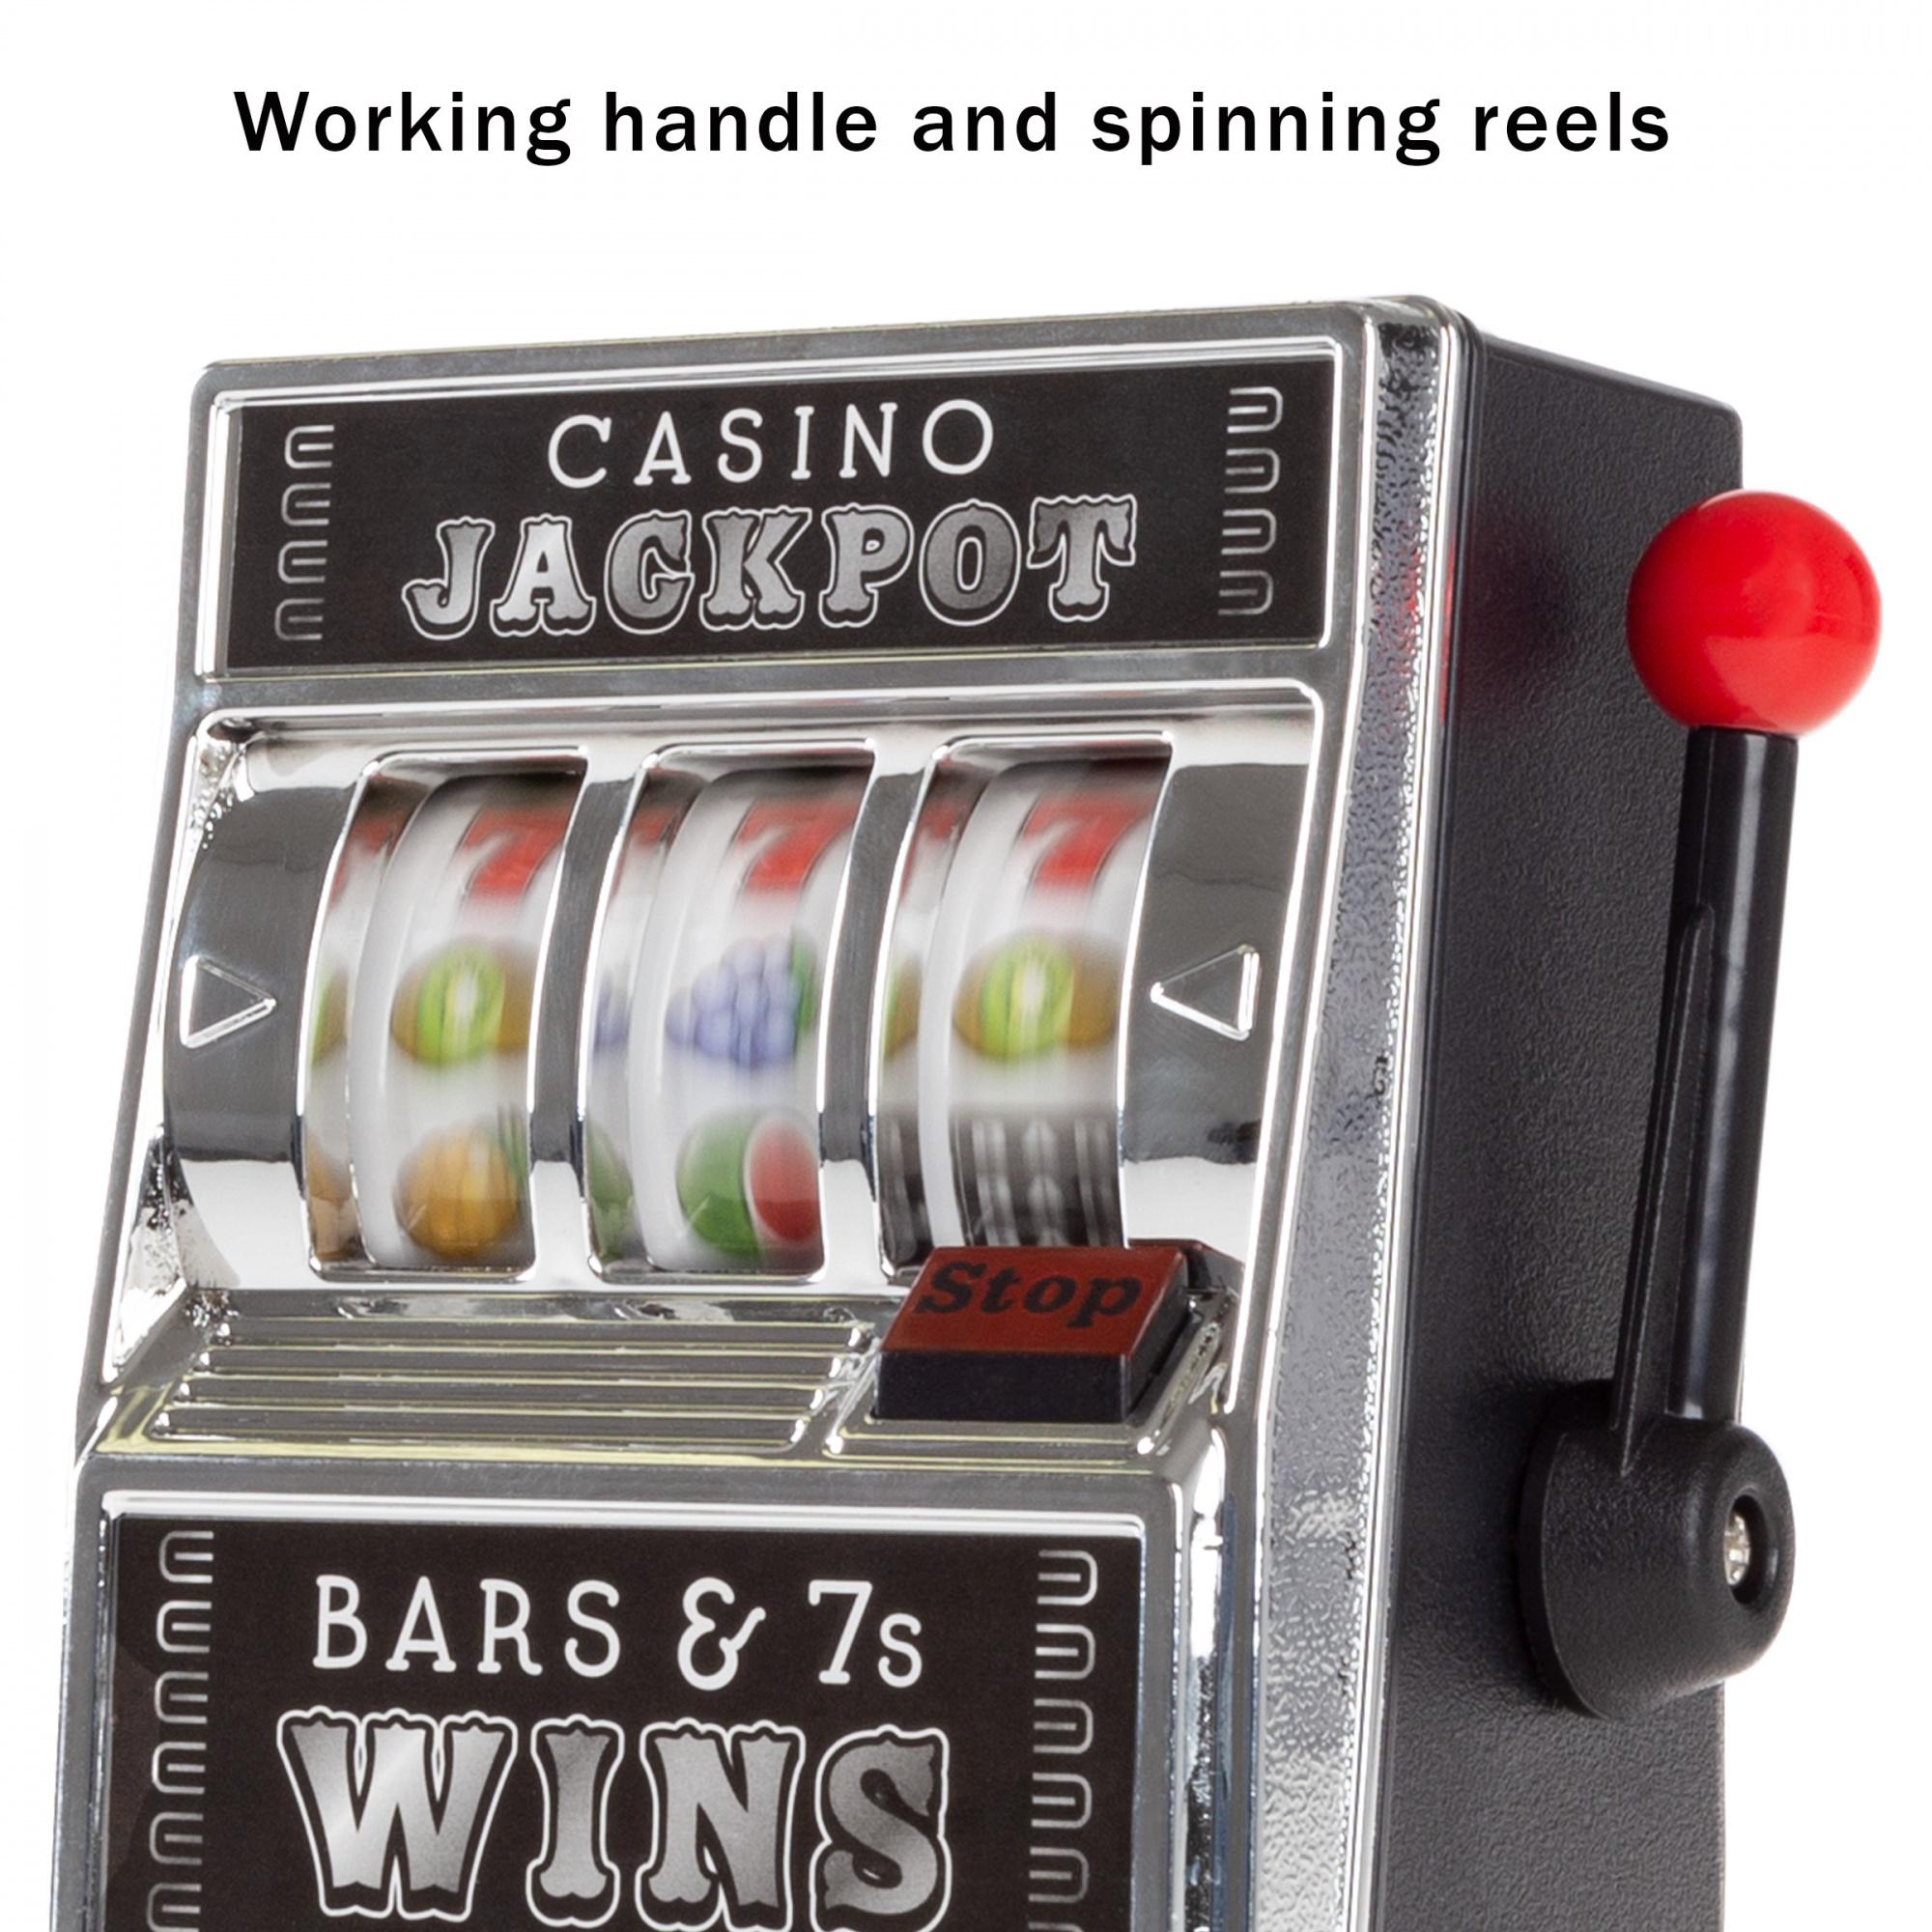 Triple magic peliautomaatti